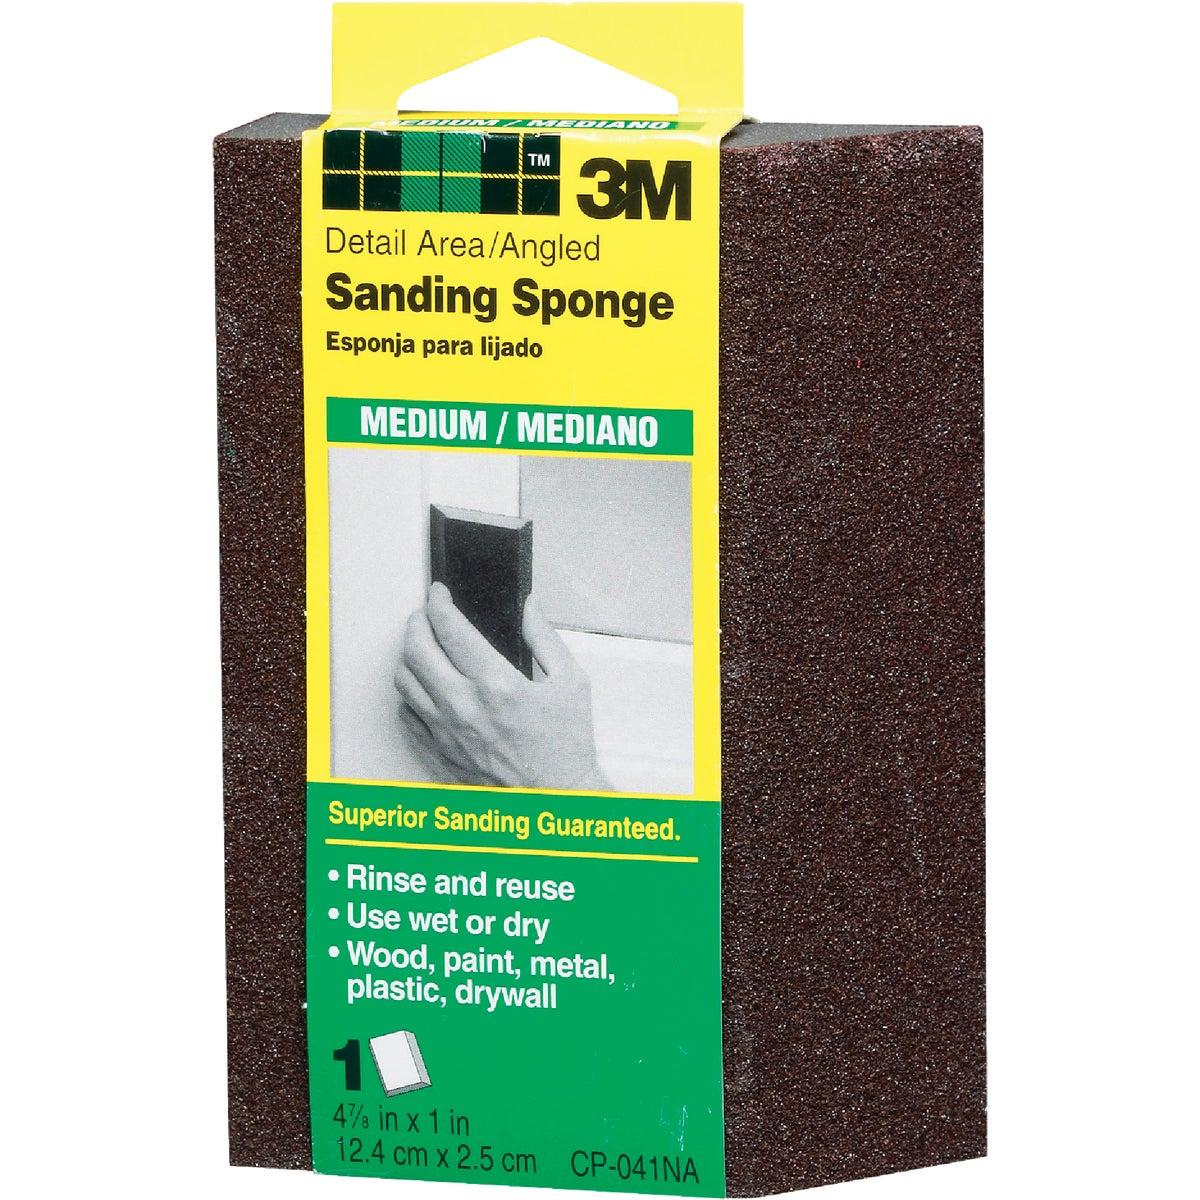 3M Angled Detail Area All-Purpose 2-7/8 In. x 4-7/8 In. x 1 In. Medium Sanding Sponge